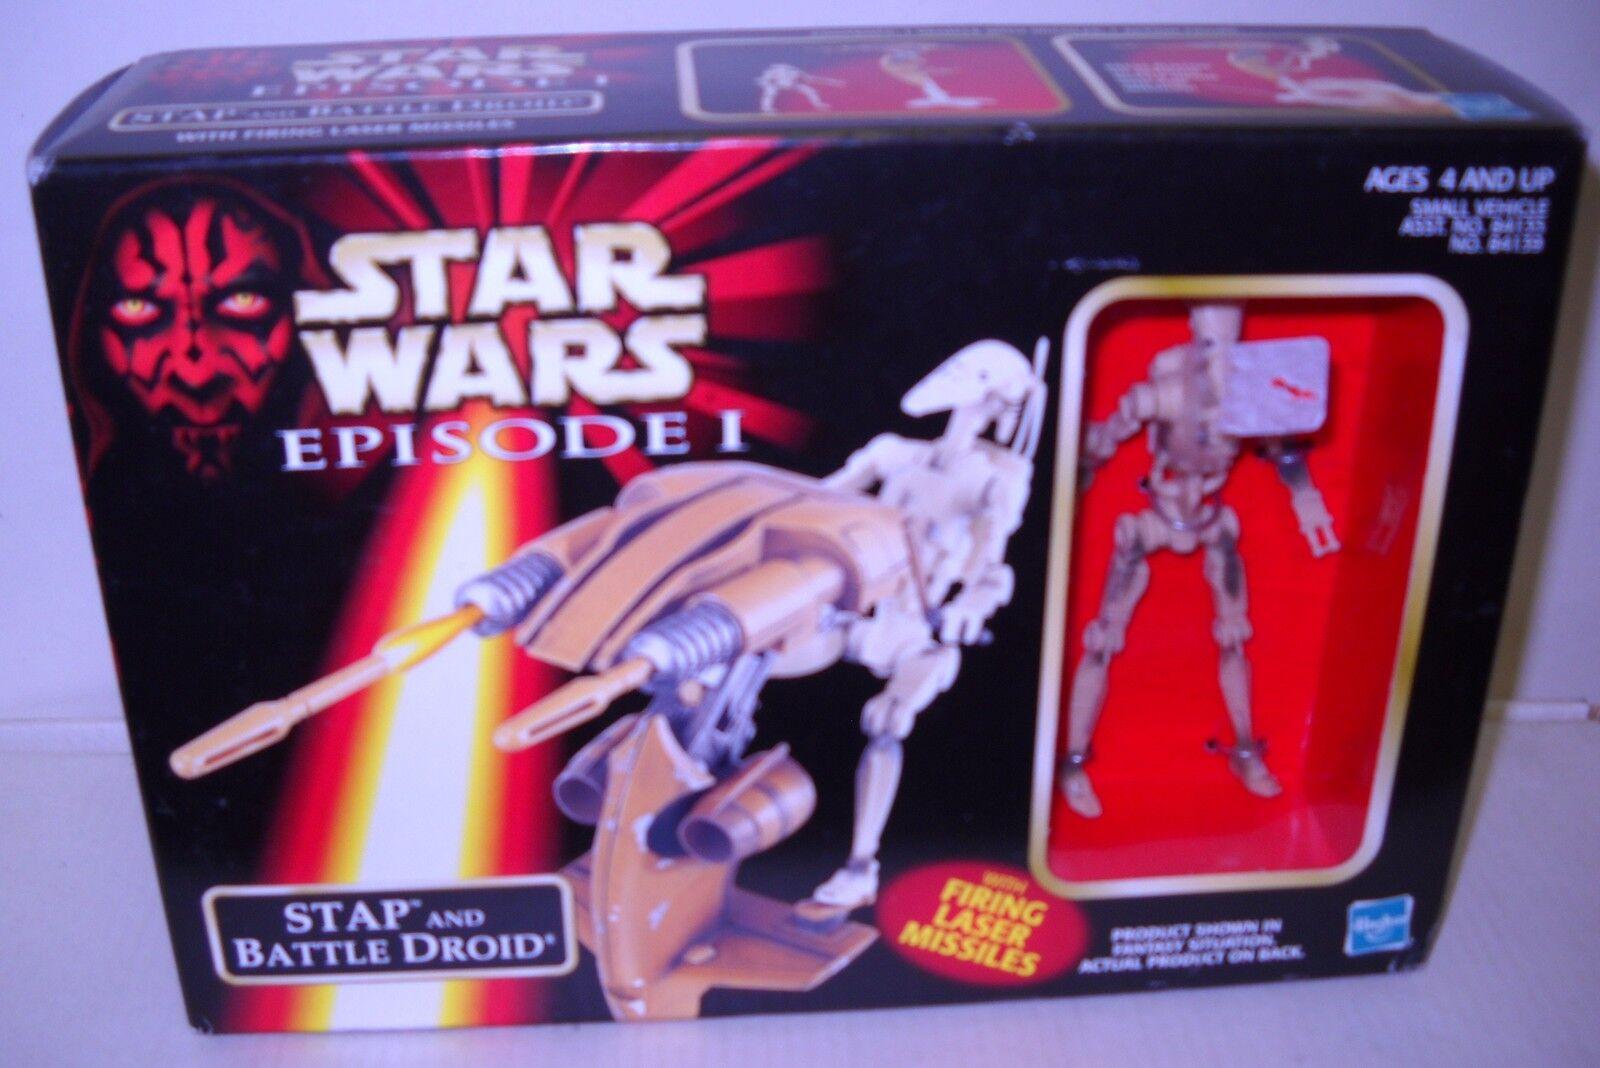 4713 NRFB Hasbro Star Wars Episode I Stap & Battle Droid Figure